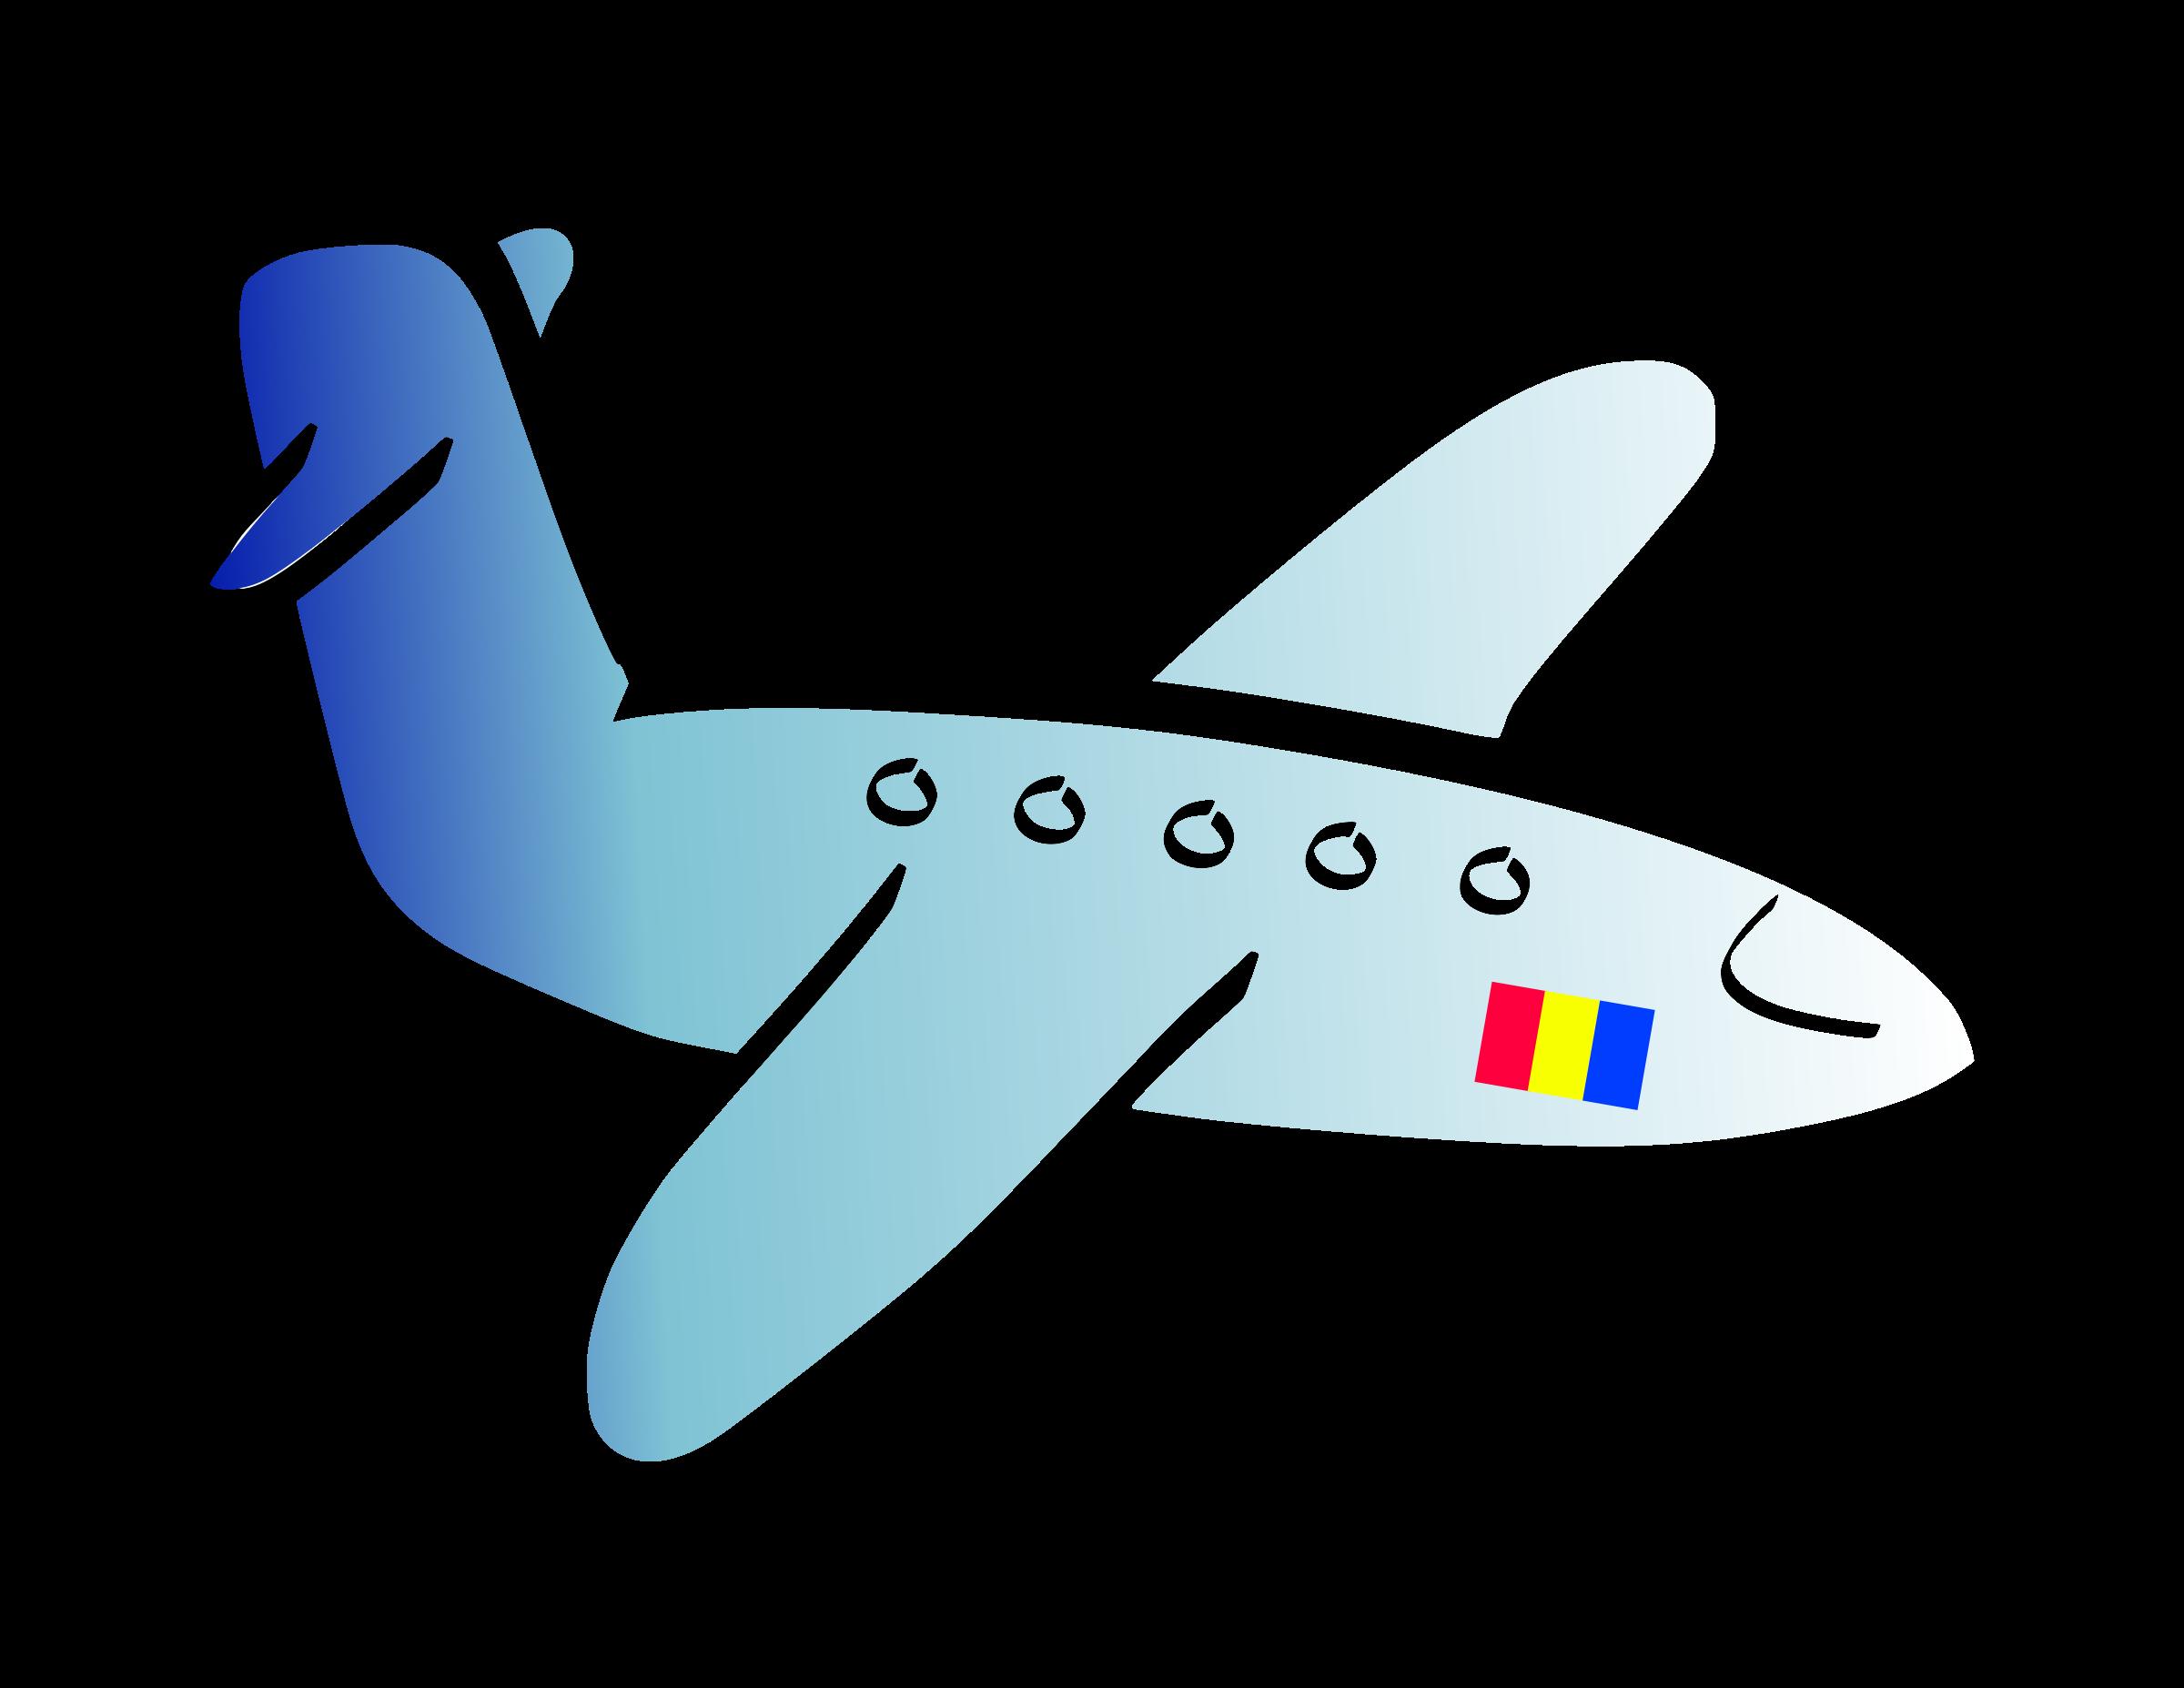 Airplane Drawing Cartoon